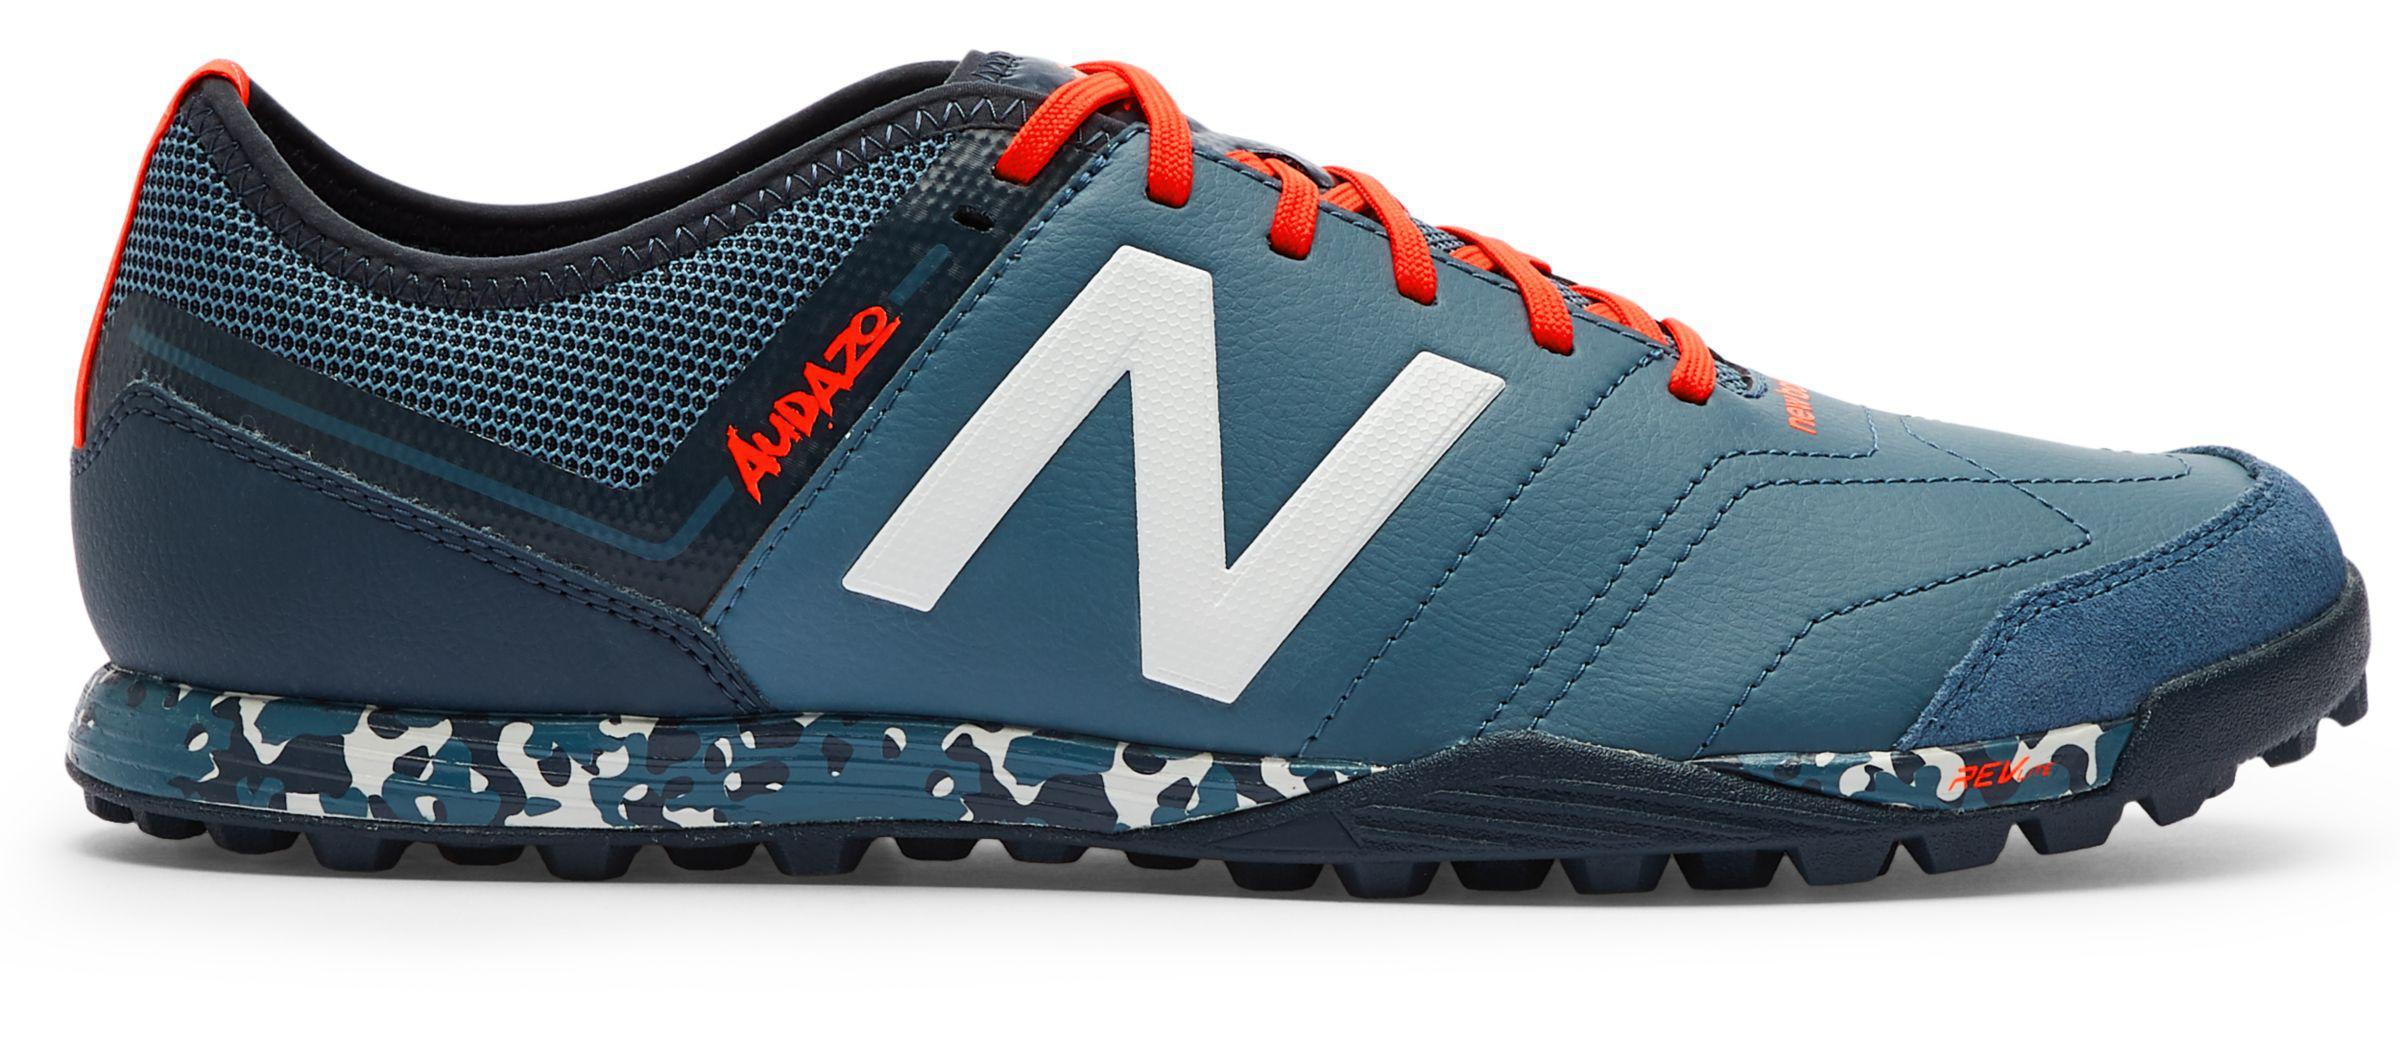 New Balance Audazo V3 Pro Tf Shoes